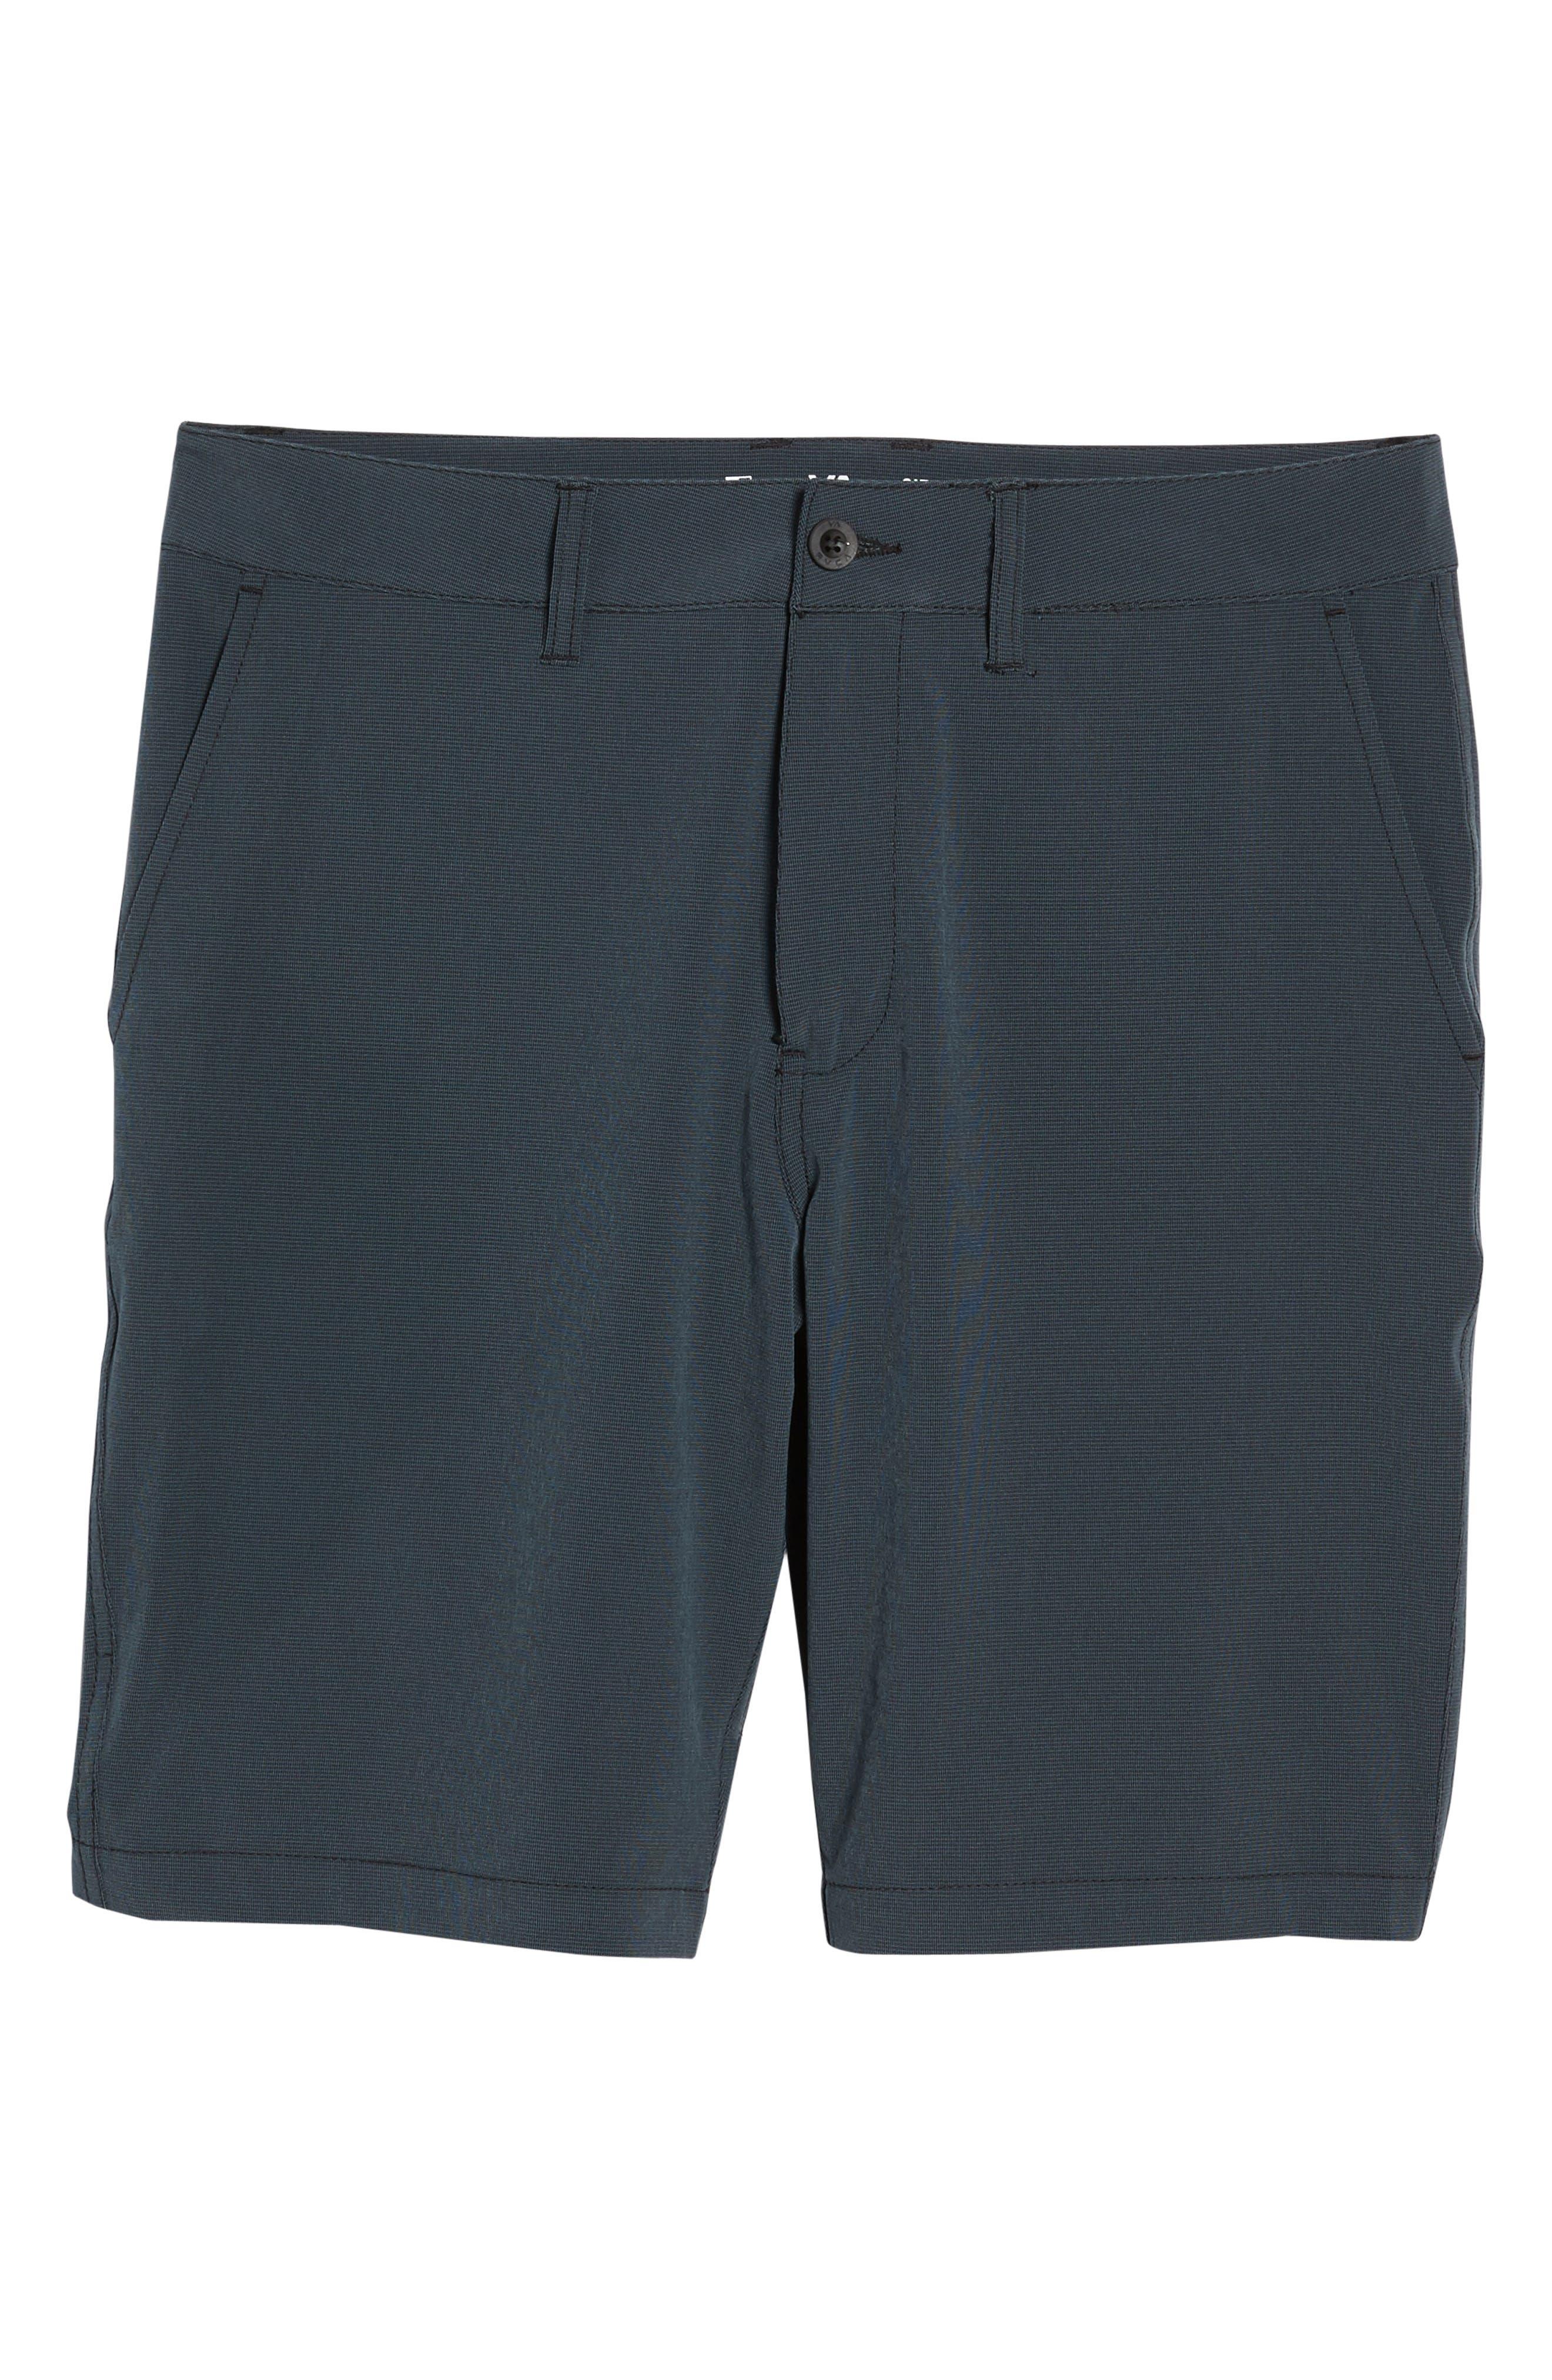 Grid Hybrid Shorts,                             Alternate thumbnail 6, color,                             001